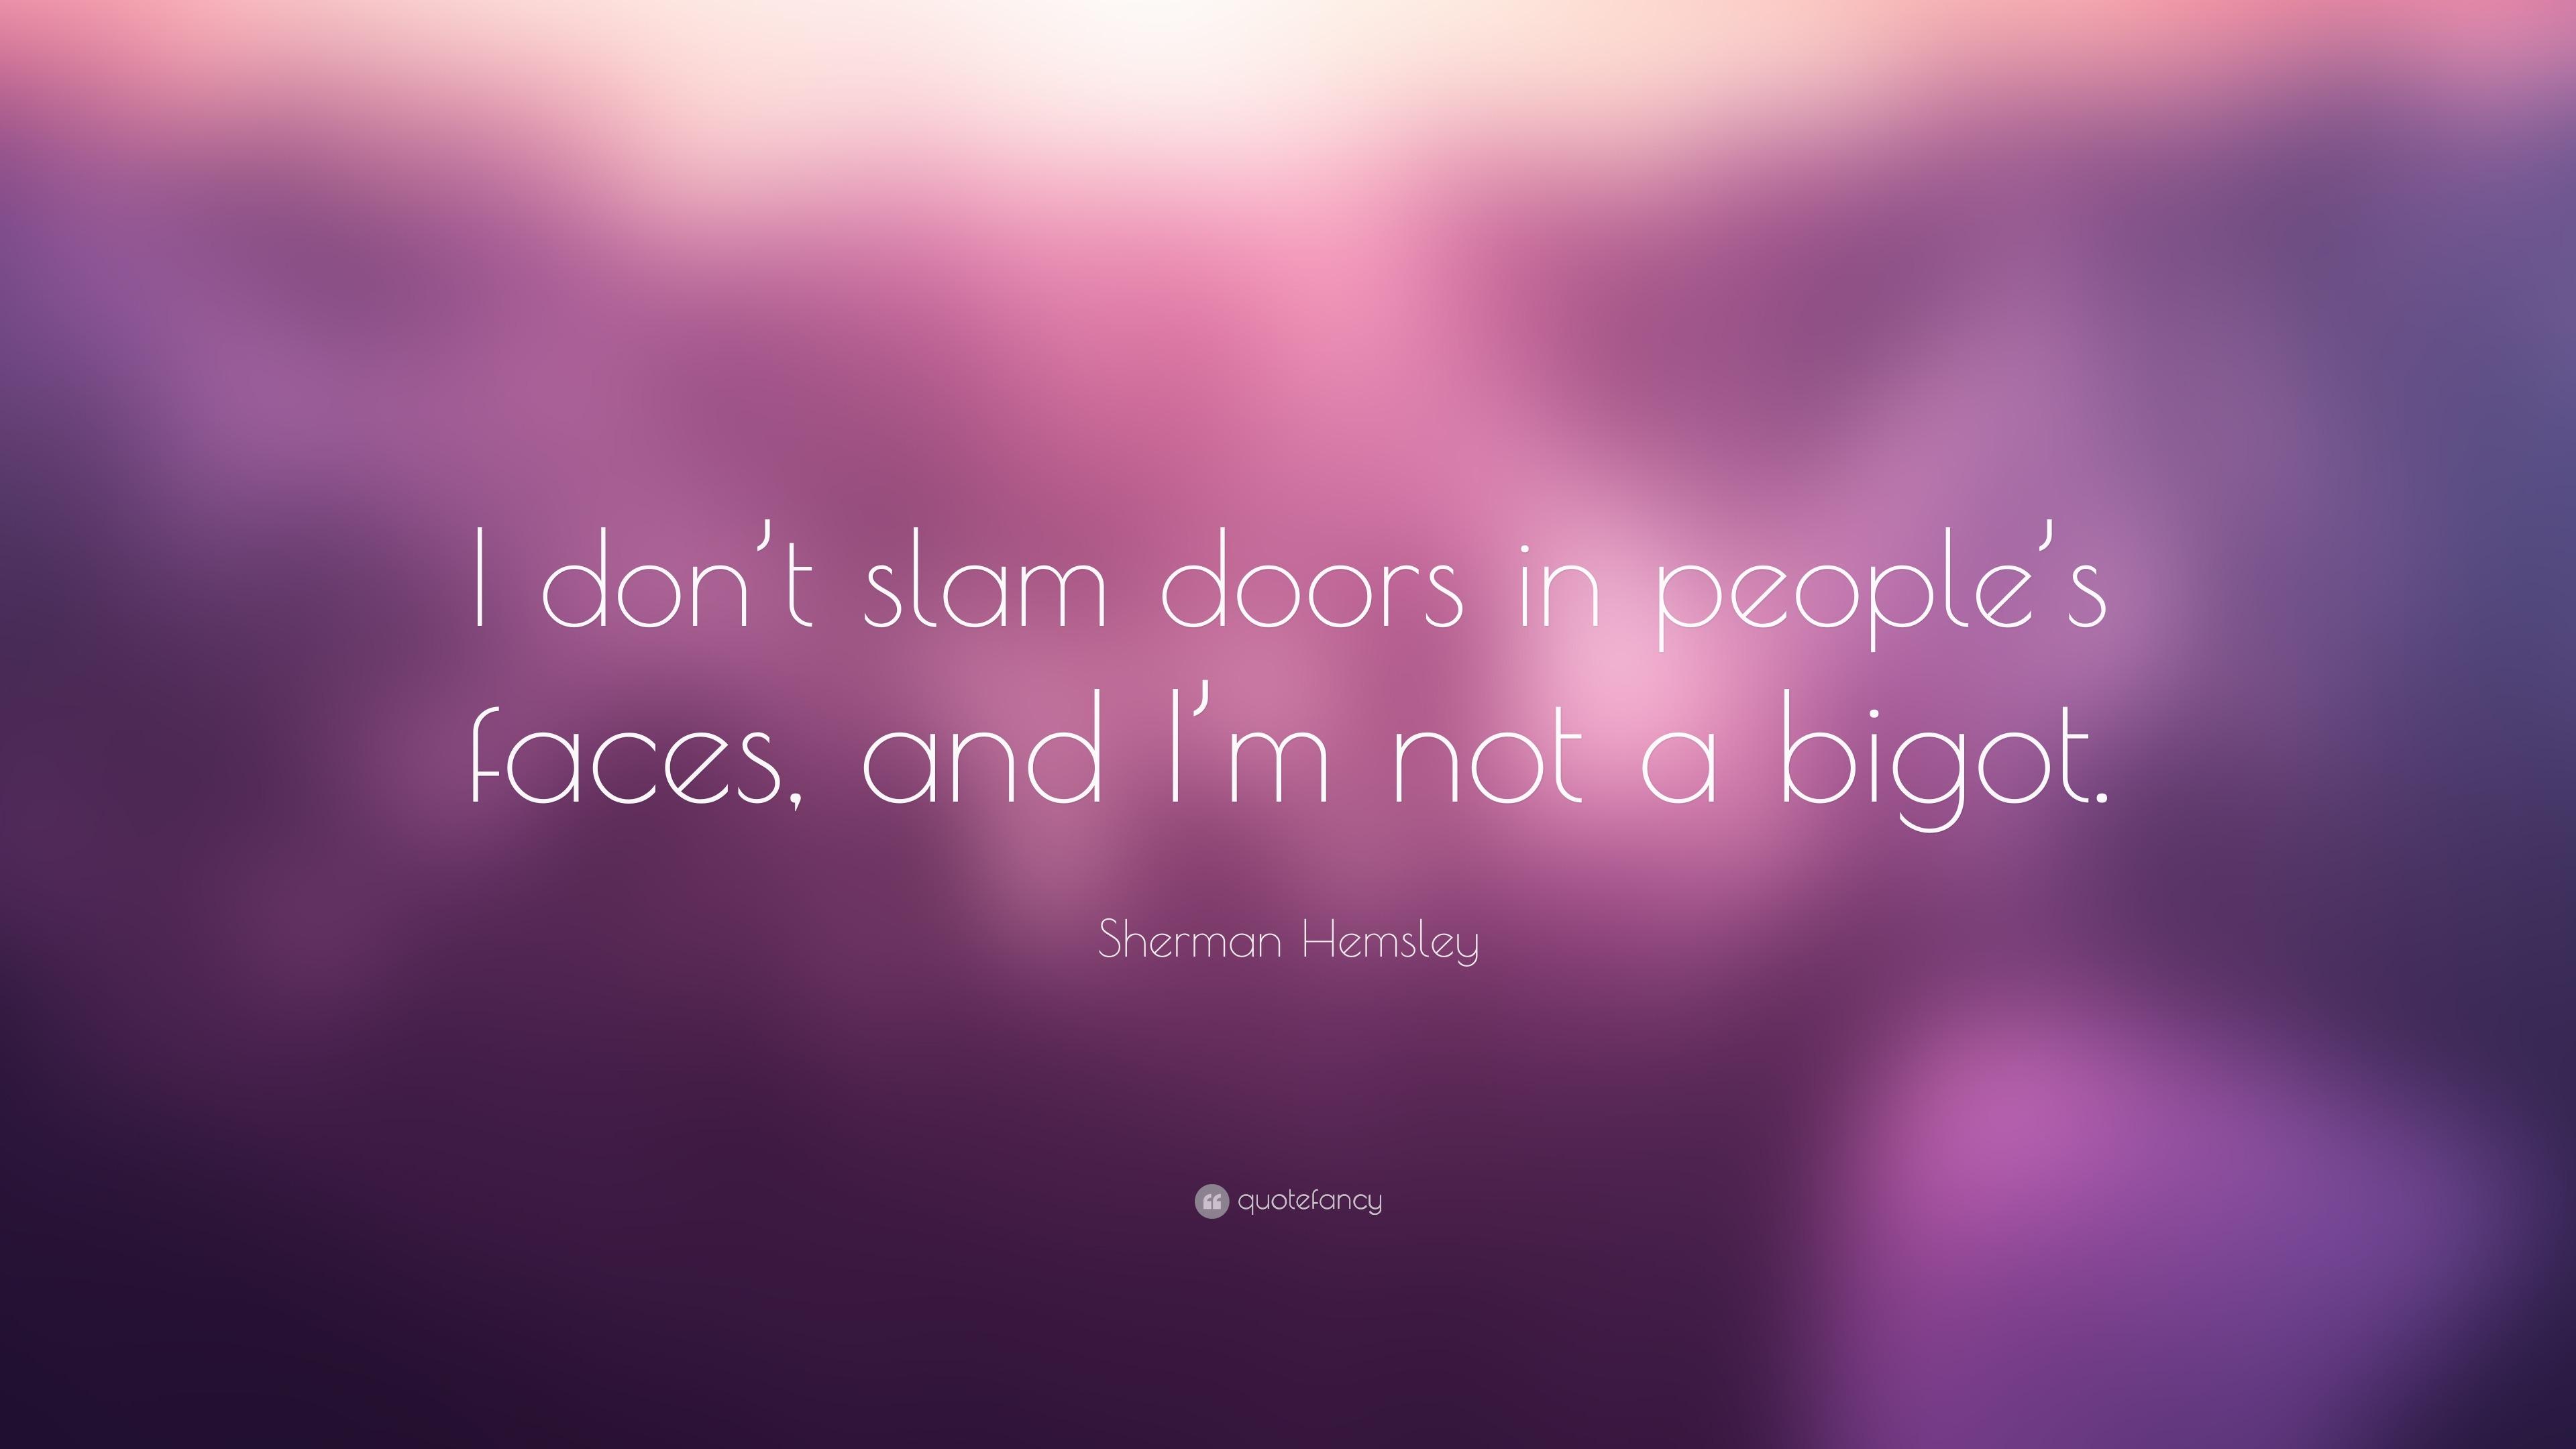 Sherman Hemsley Quote \u201cI don\u0027t slam doors in people\u0027s faces and & Sherman Hemsley Quote: \u201cI don\u0027t slam doors in people\u0027s faces and I ...